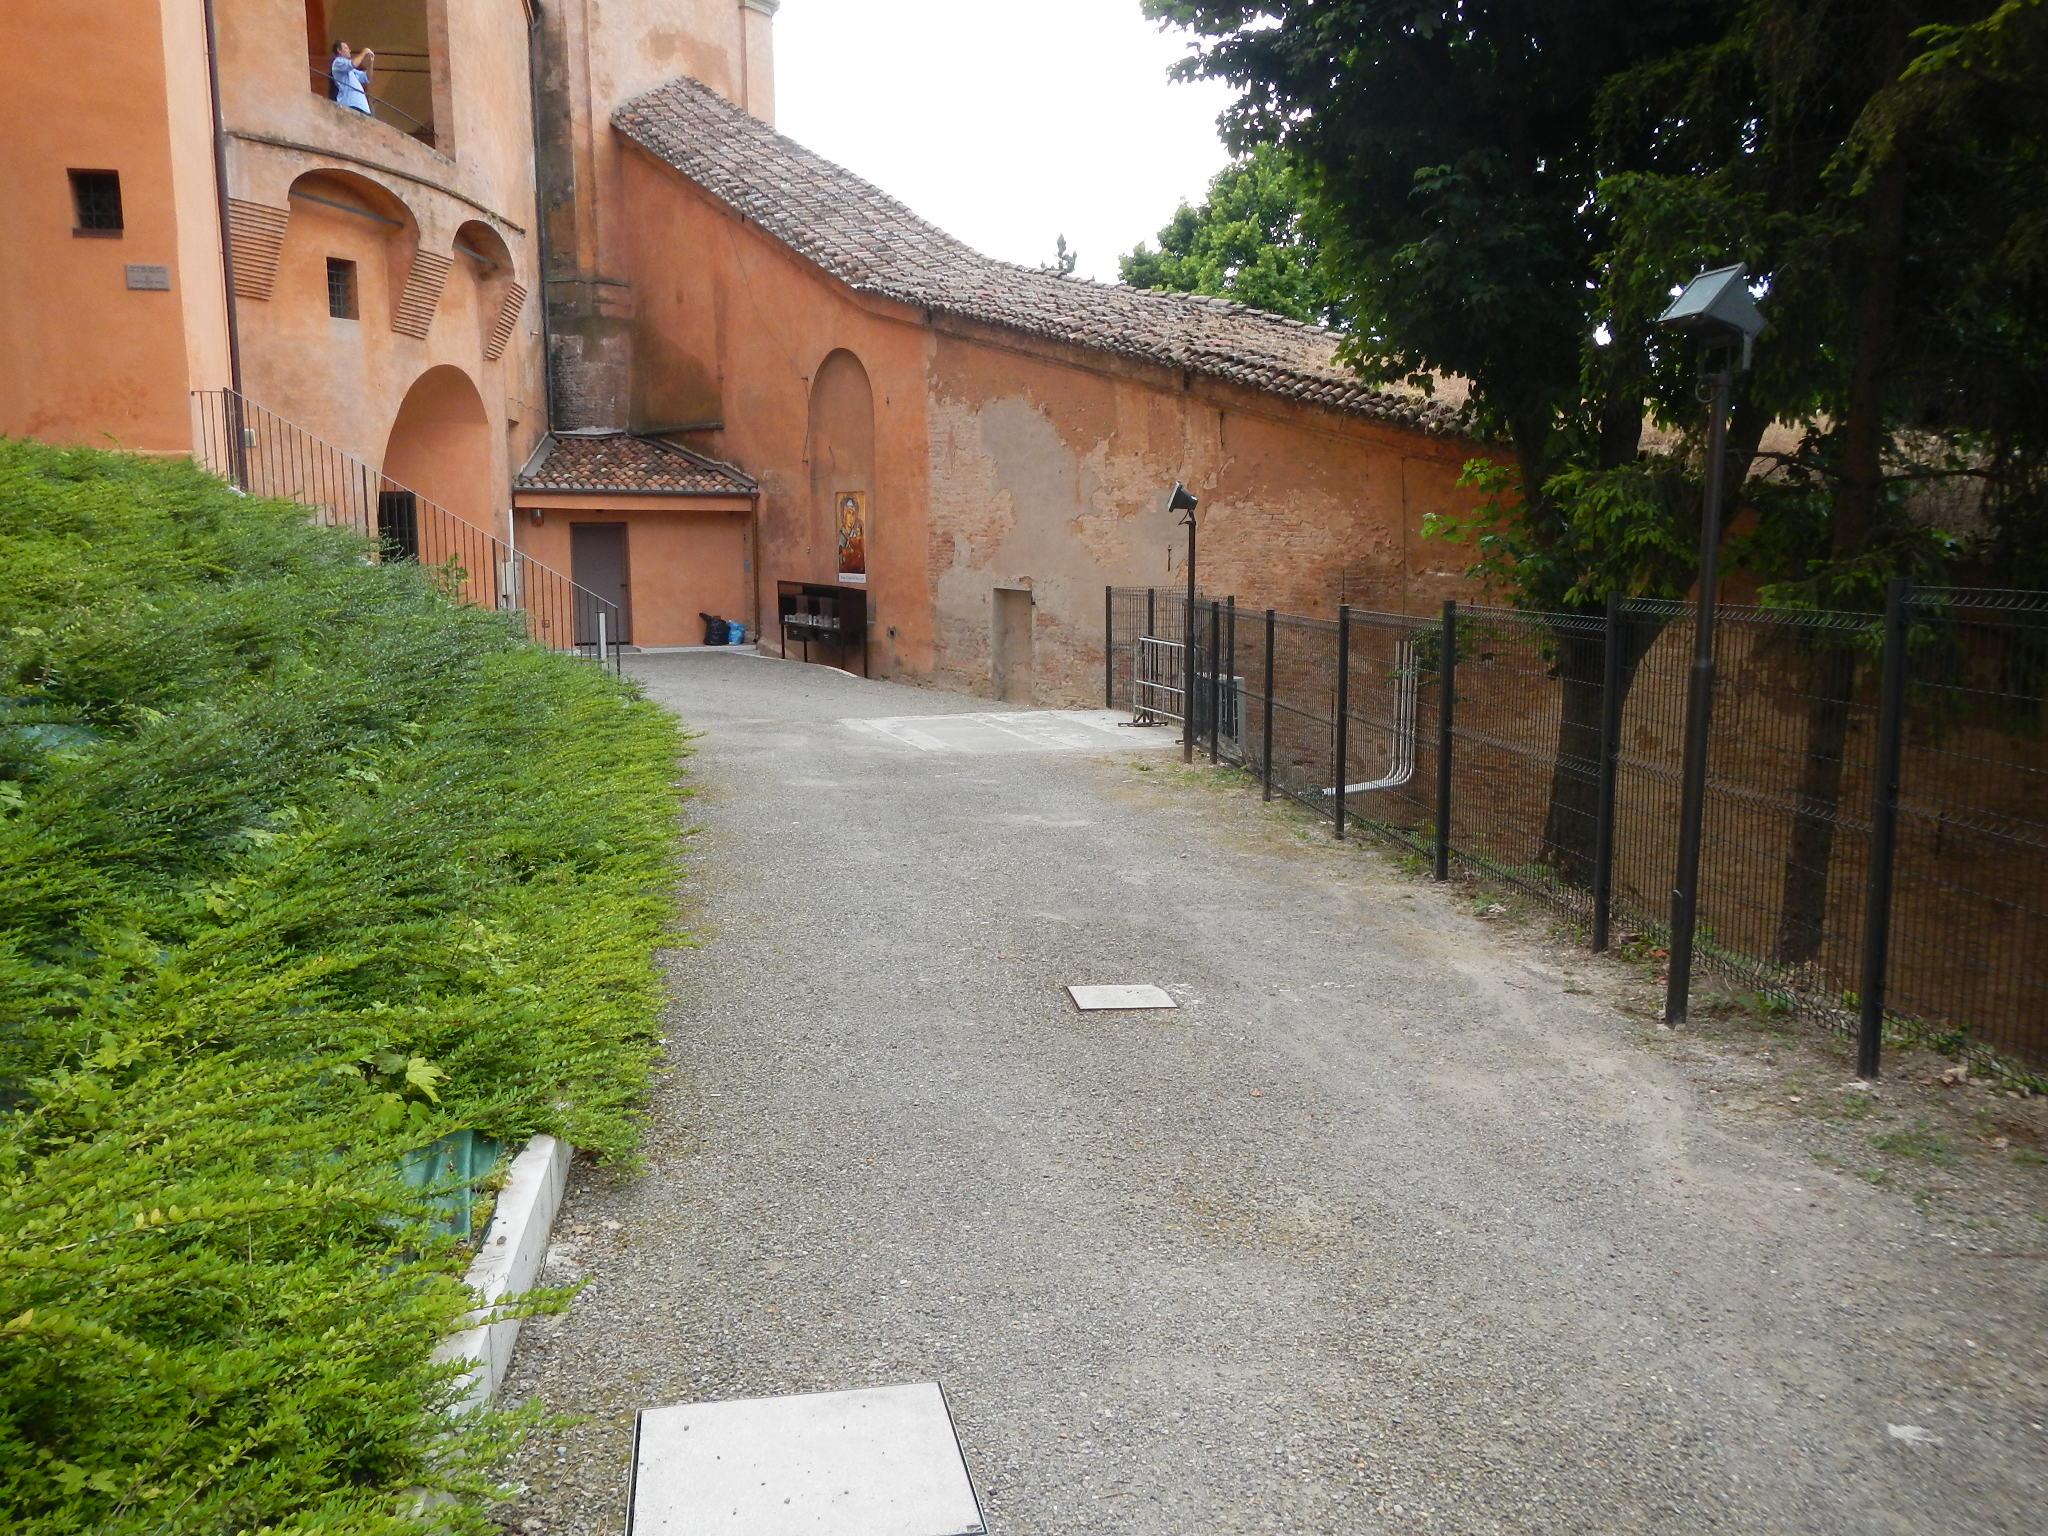 Sicurezza Lavoro Ingegneria Luca Lenzi Bologna Basilica San Luca